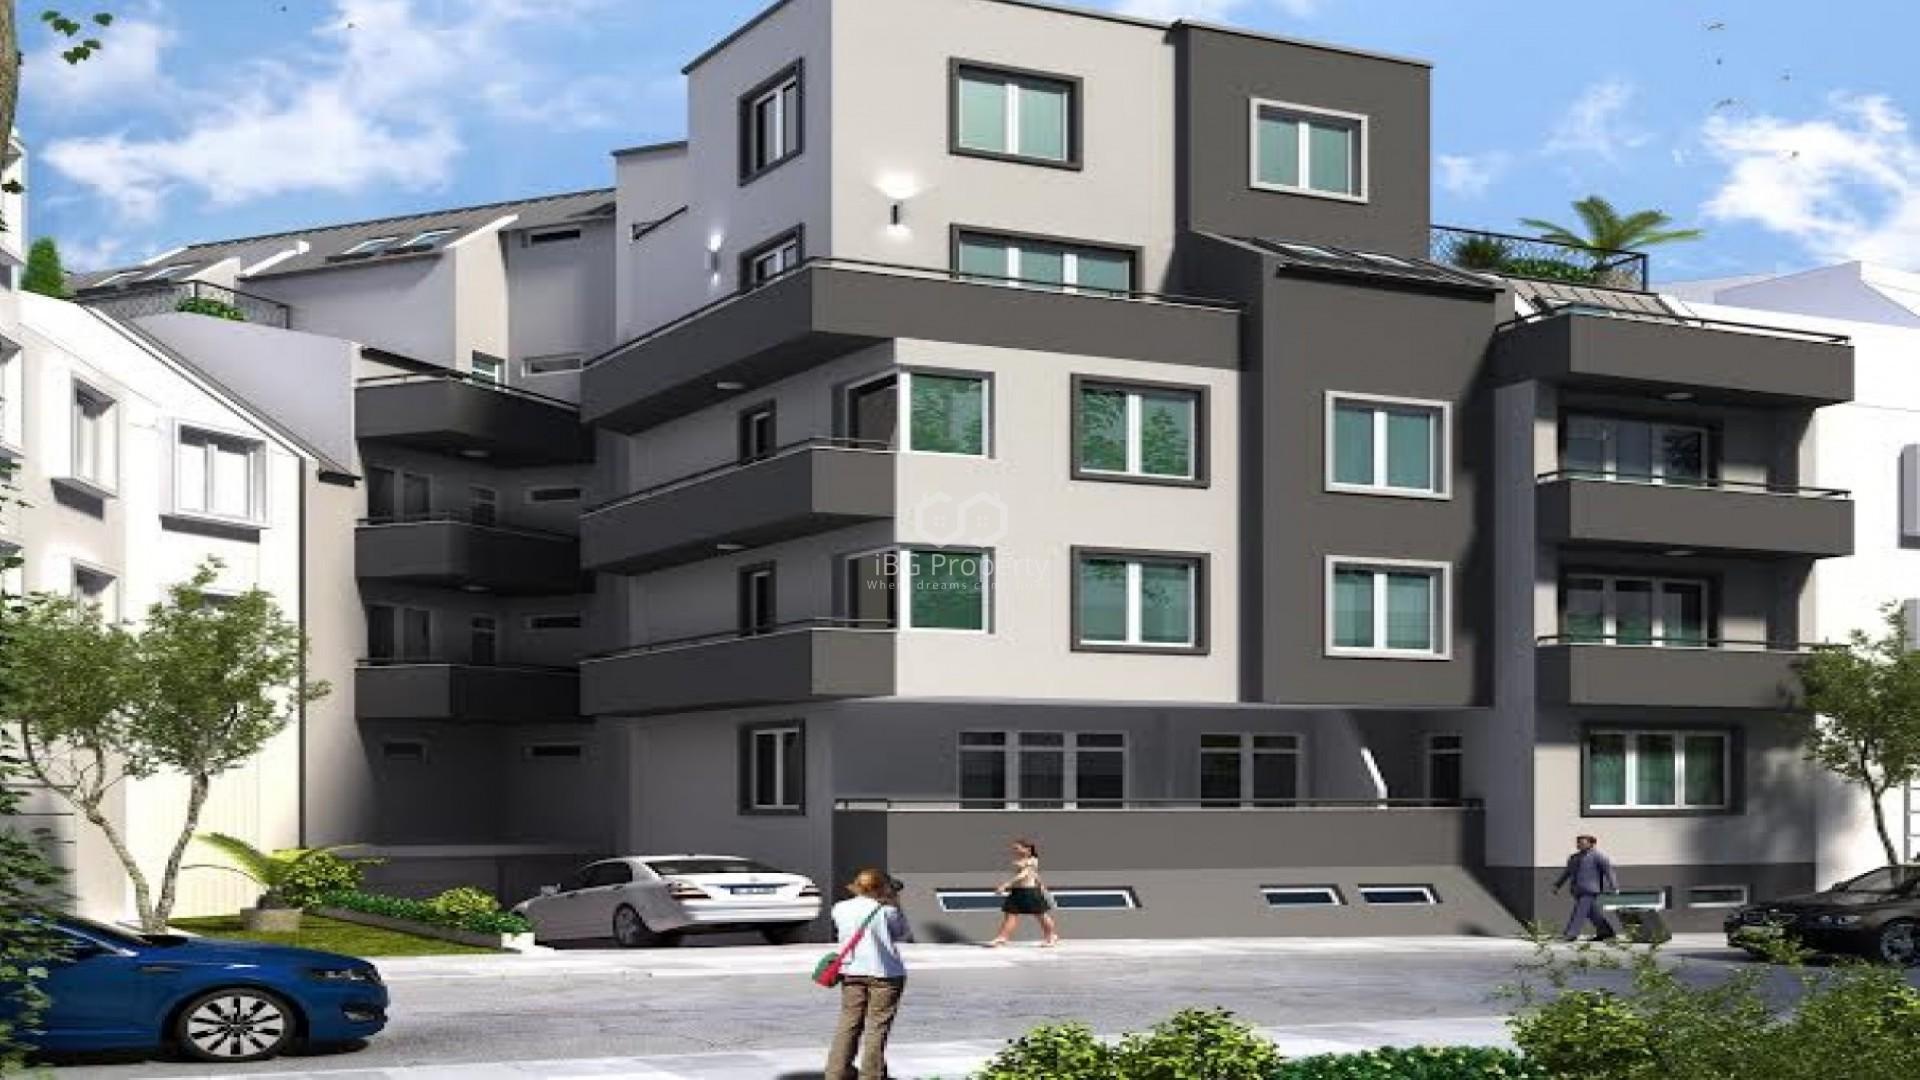 Двустаен апартамент Погреби Варна 70 m2